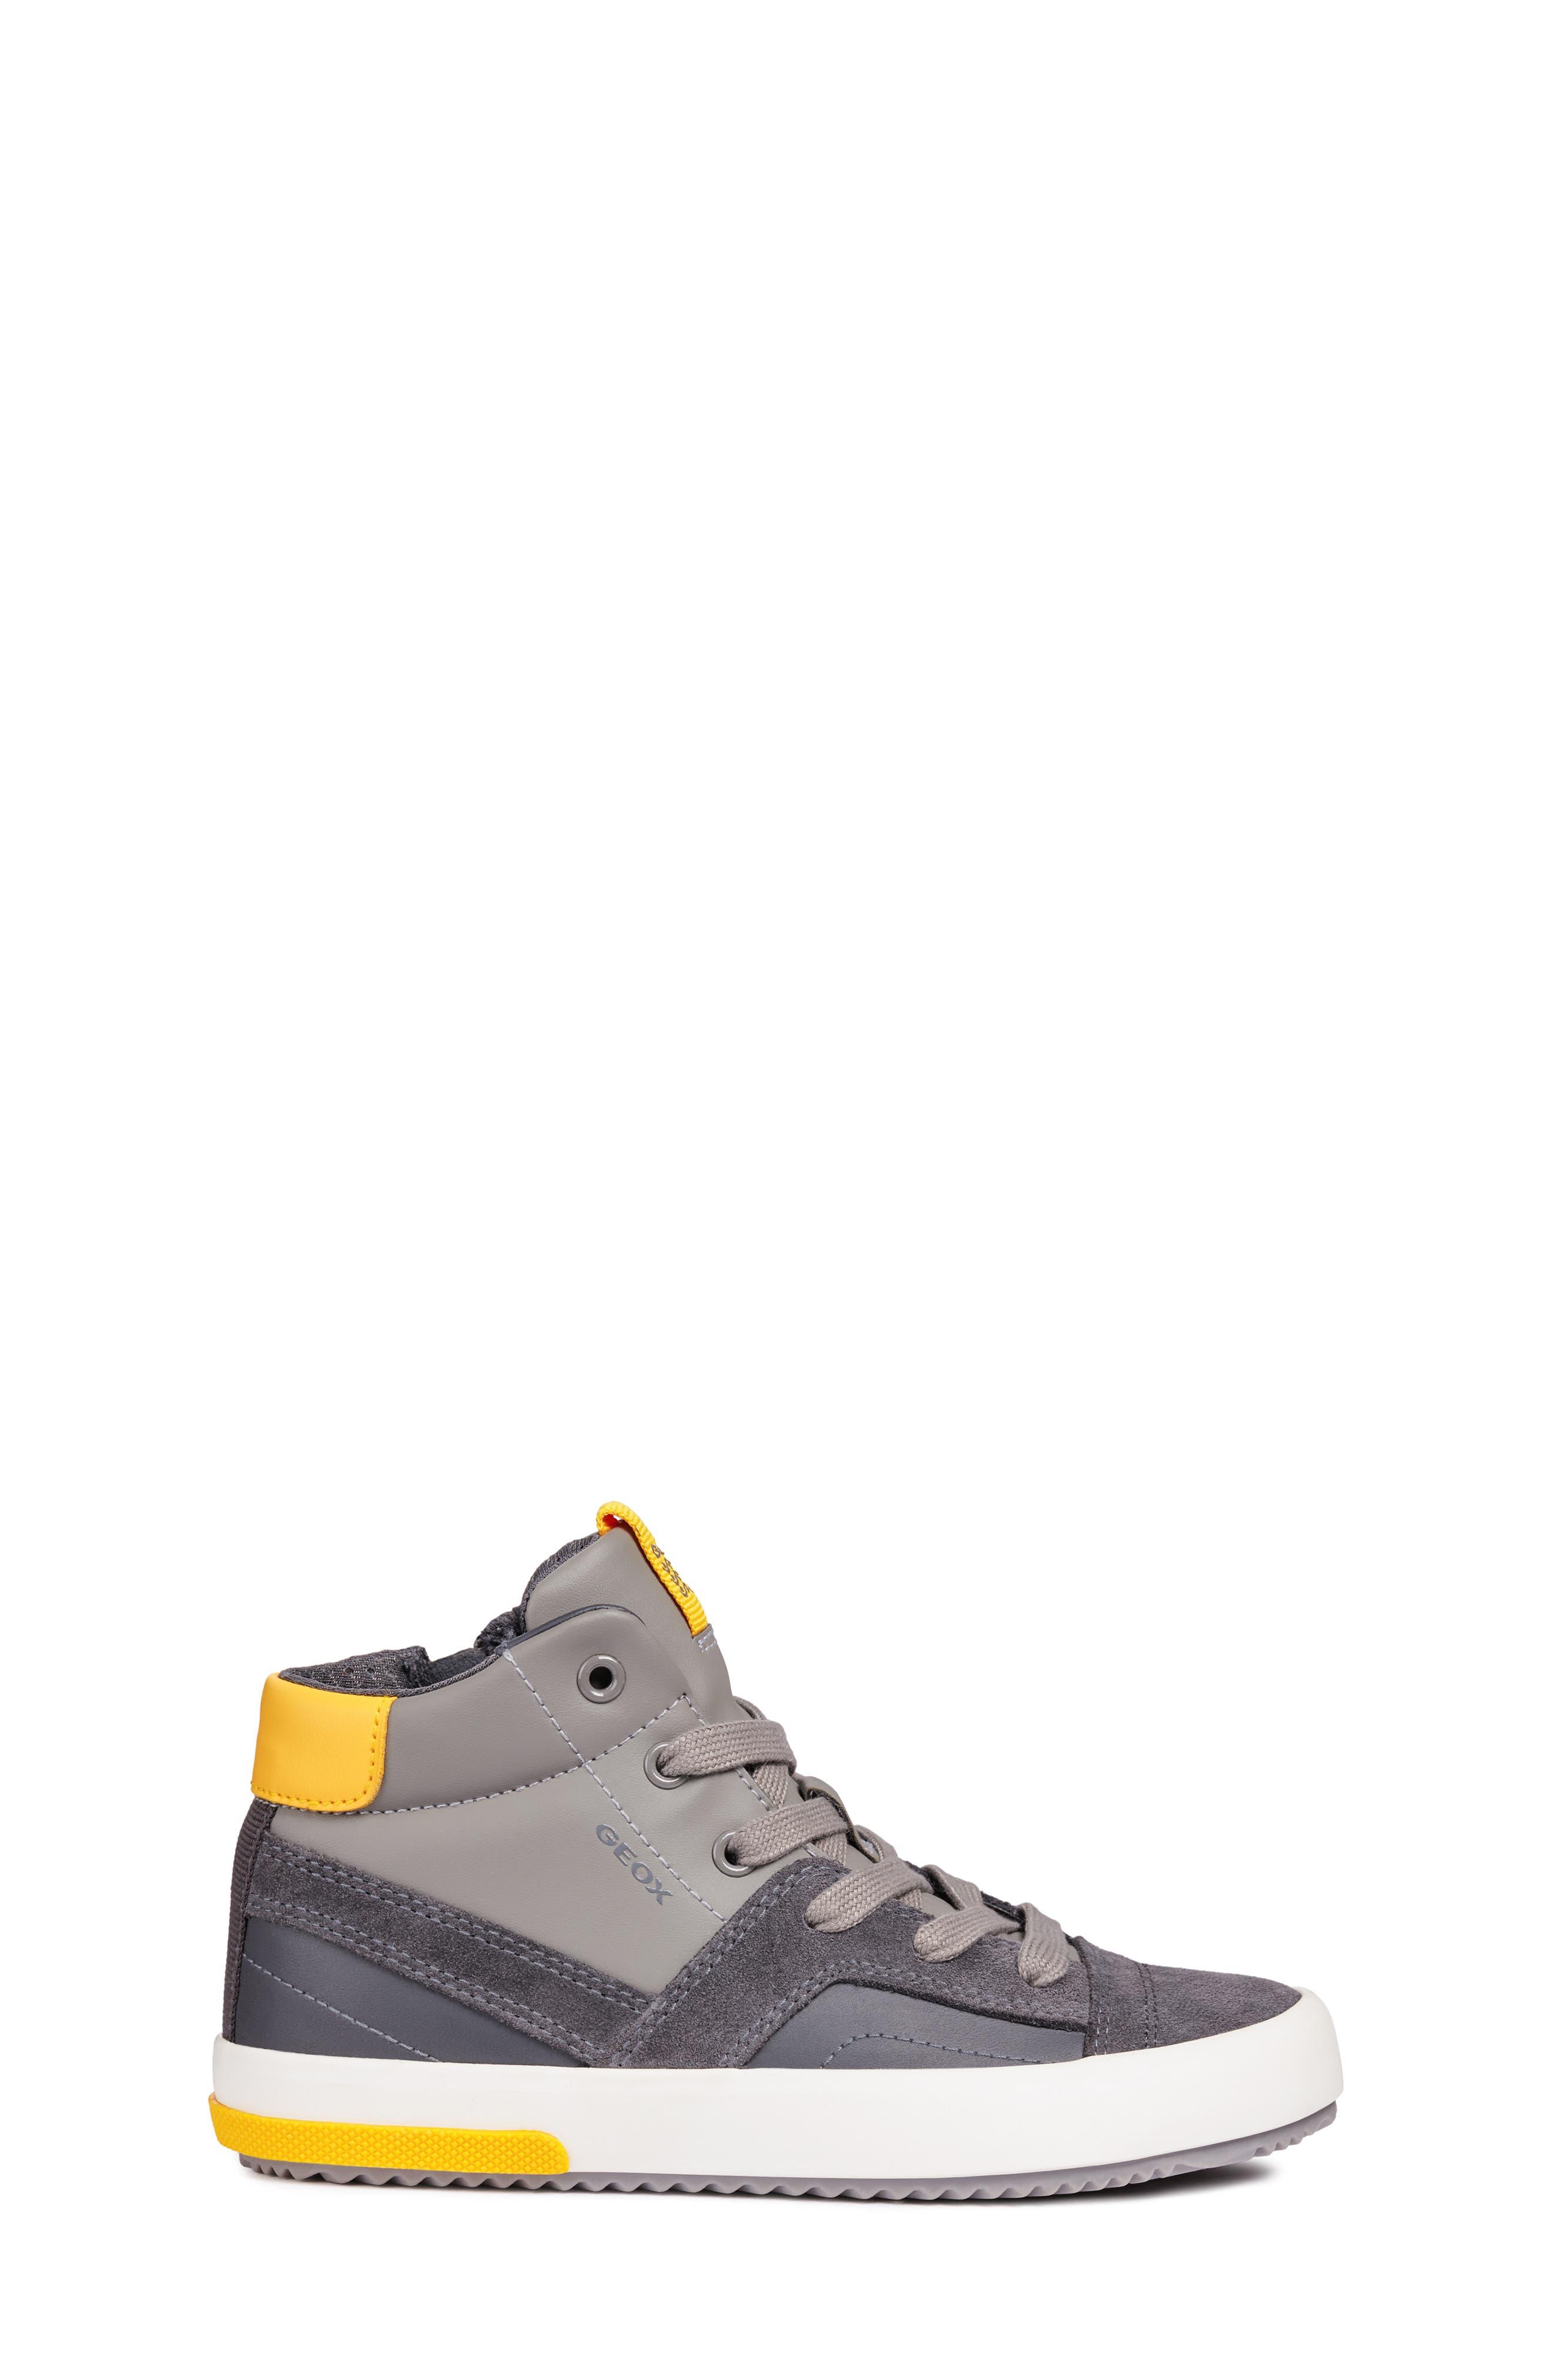 Alonisso 24 High Top Sneaker,                             Alternate thumbnail 3, color,                             DARK GREY/YELLOW